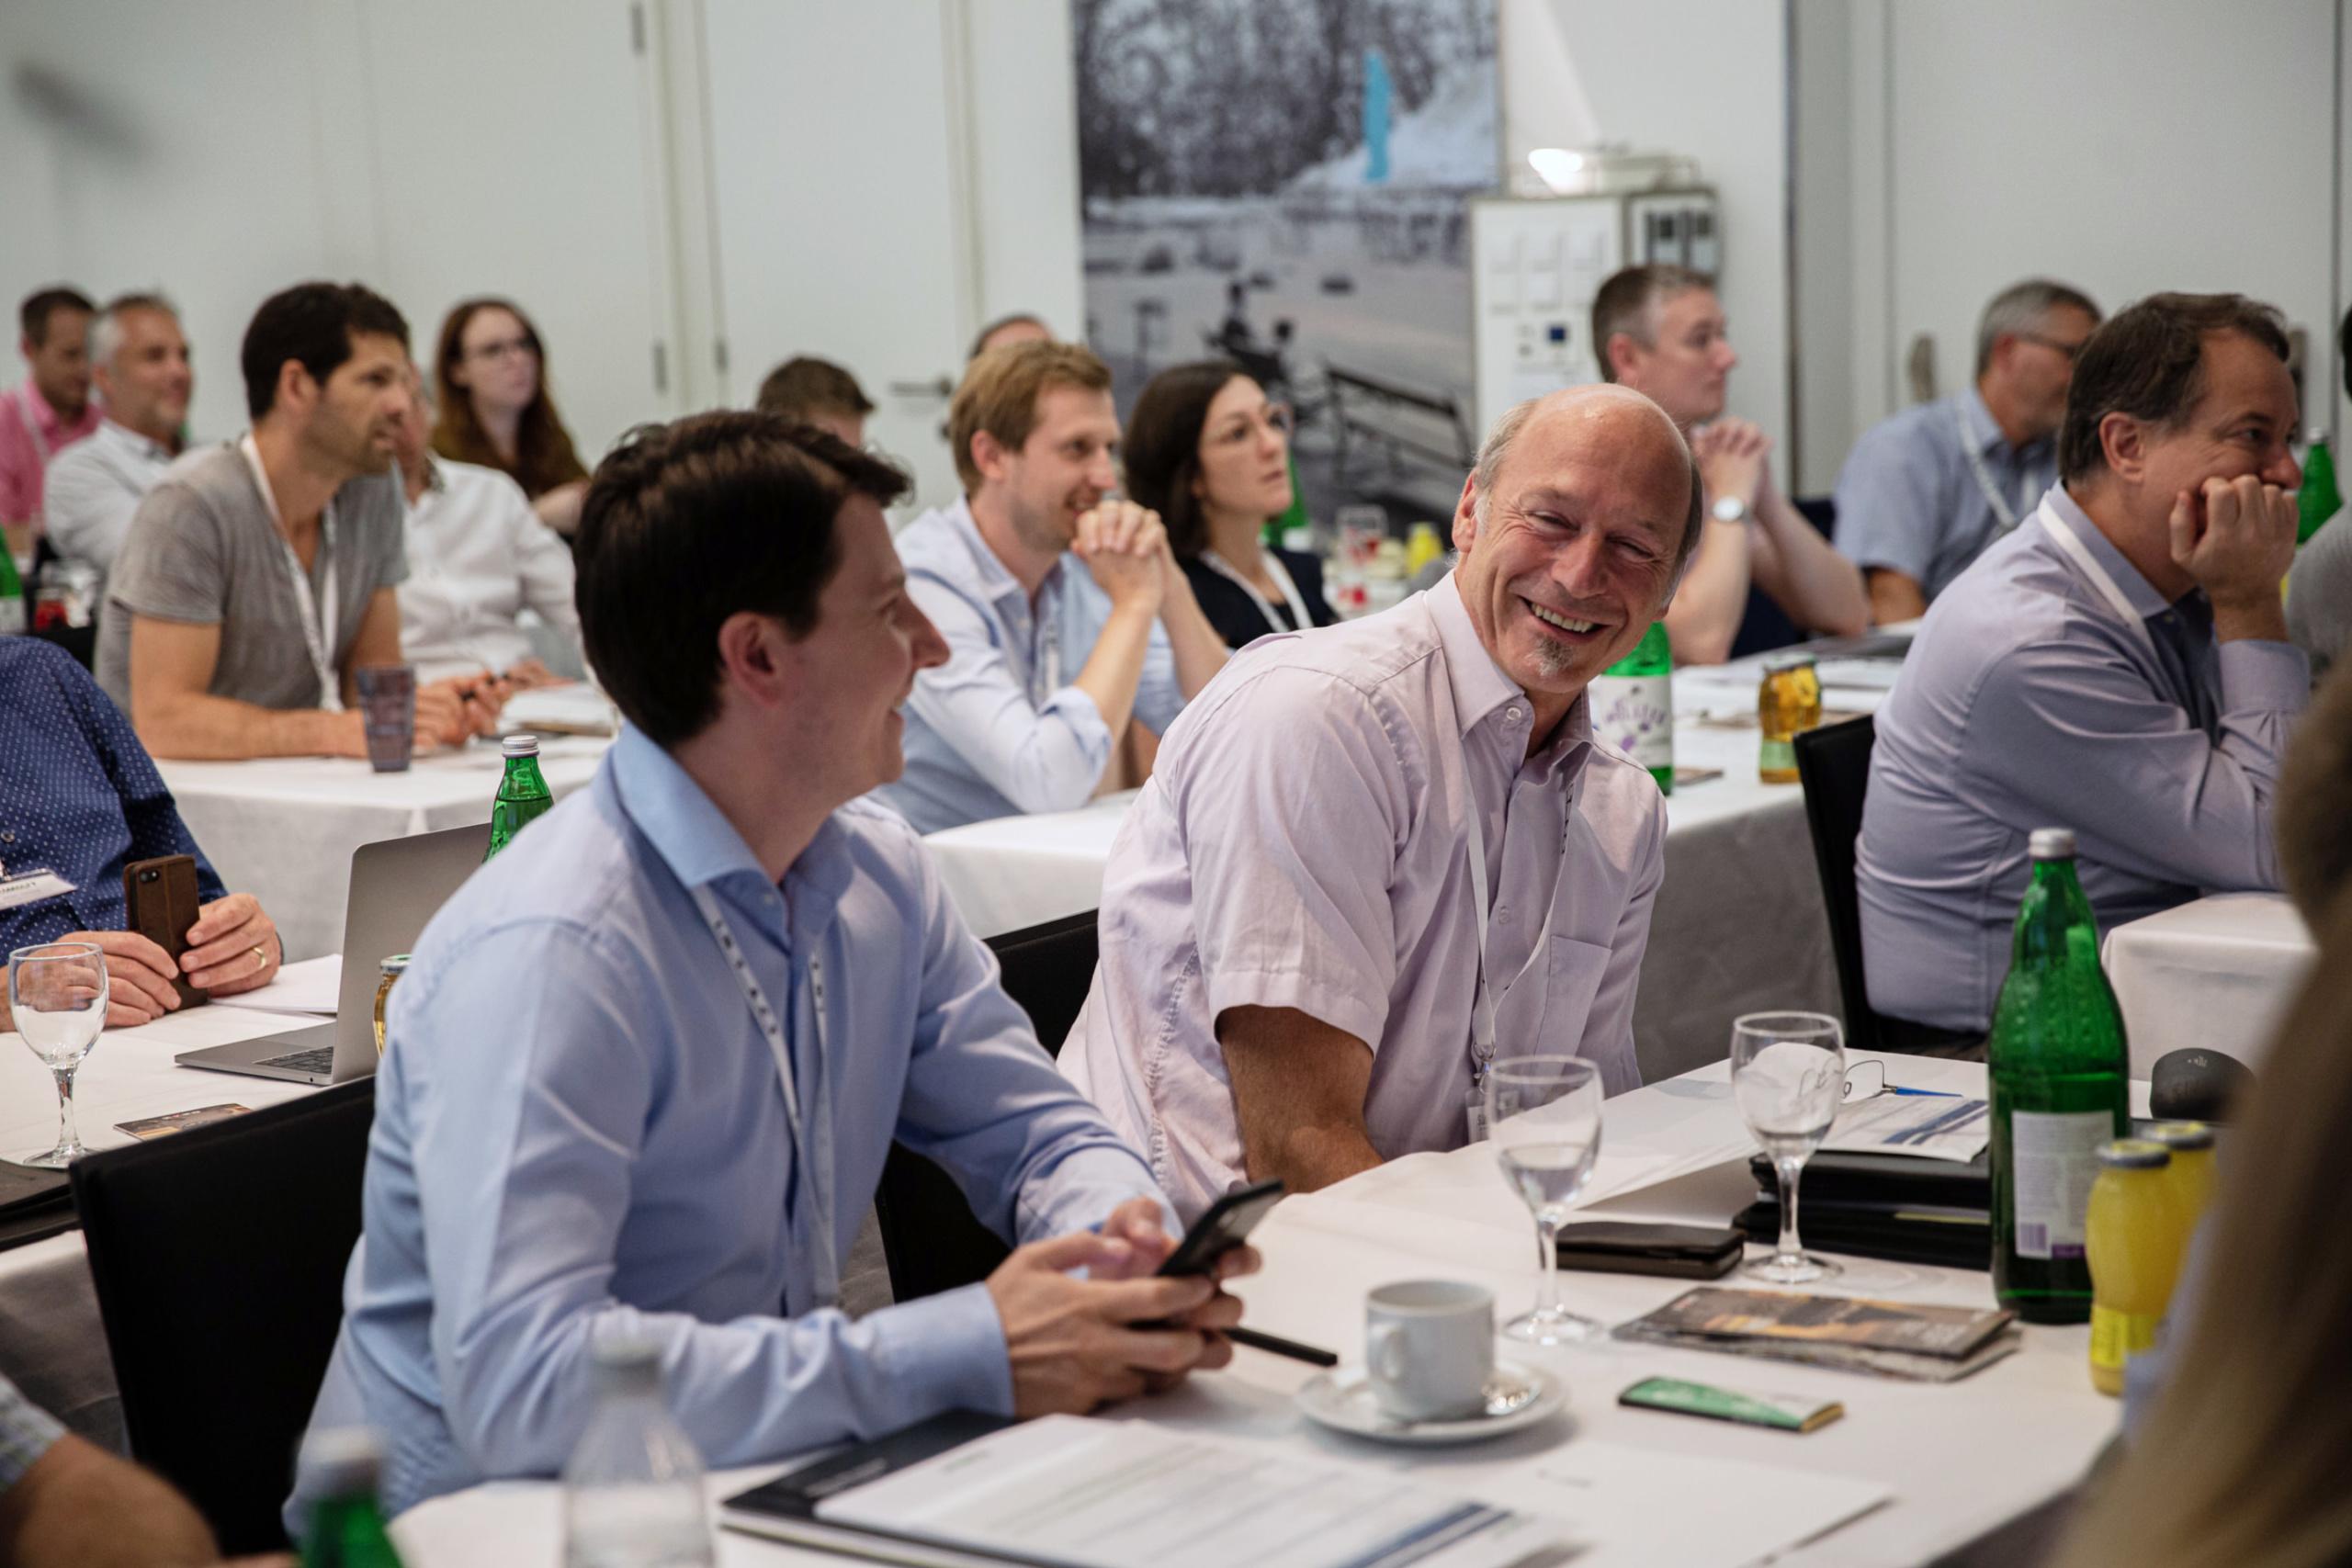 Intact Summit 2019 in Graz